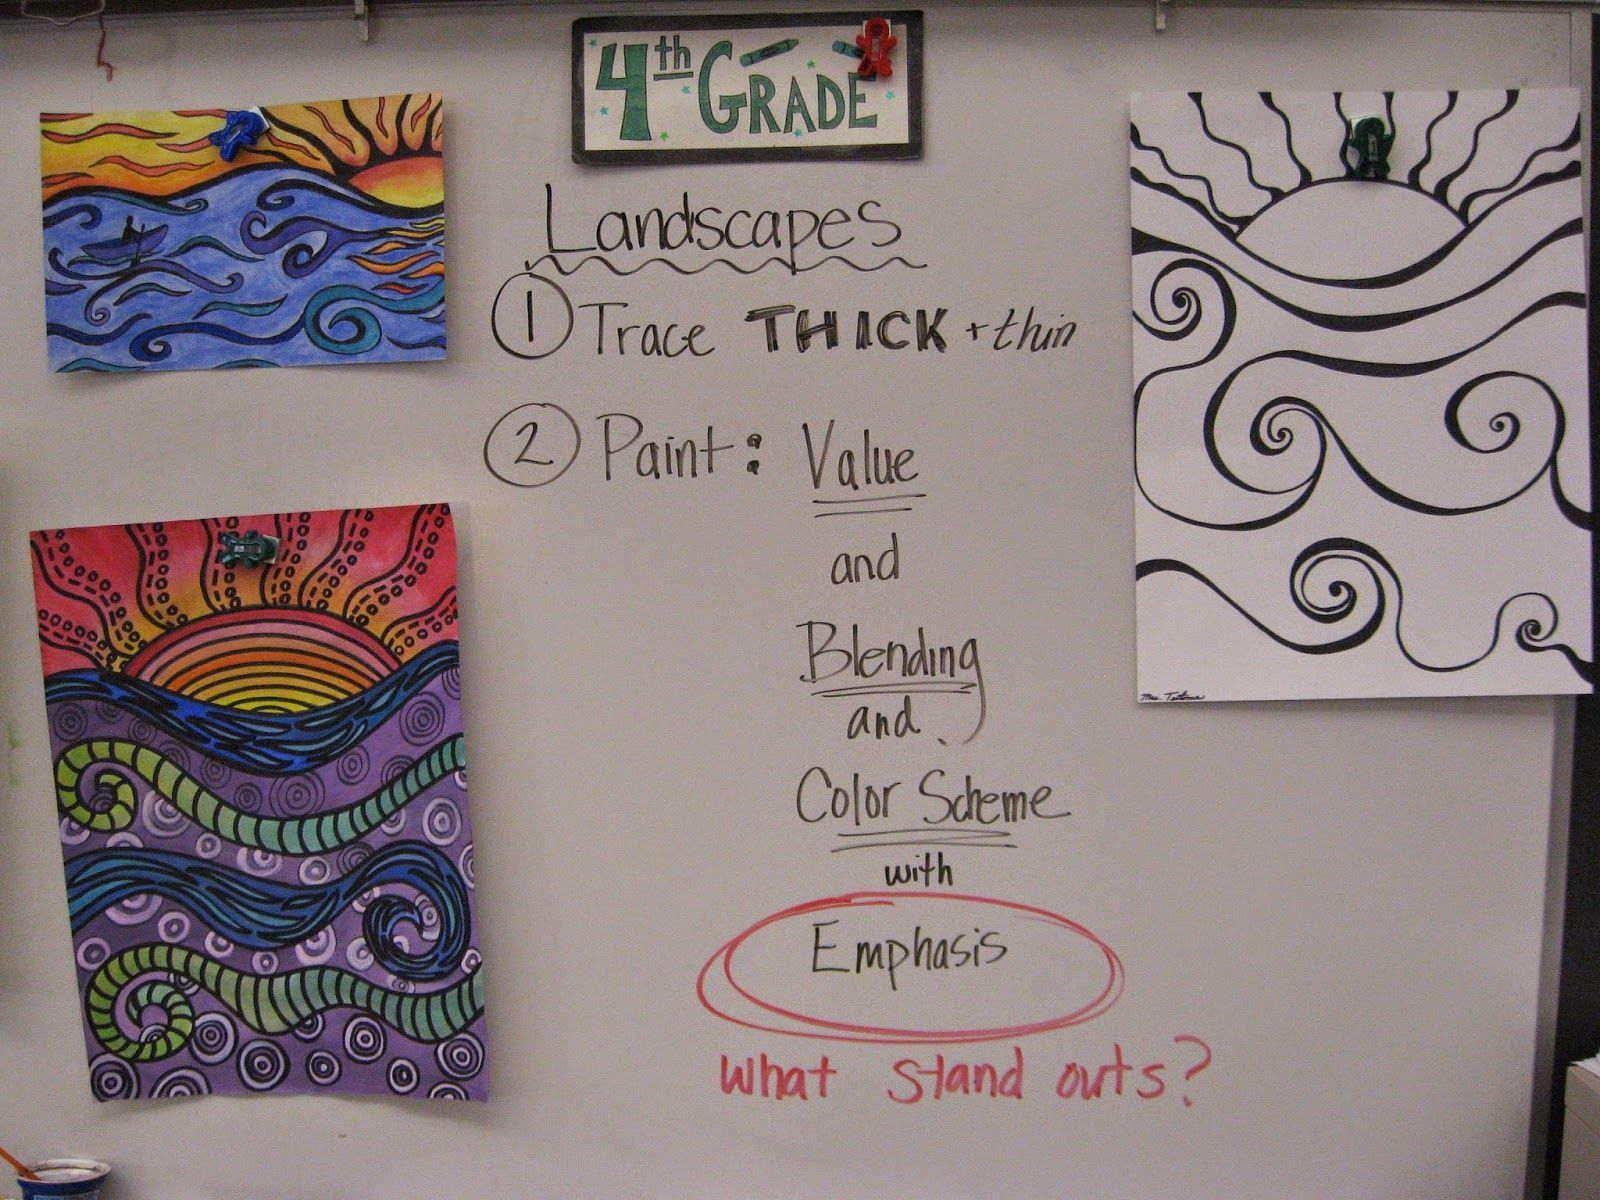 Jamestown Elementary Art Blog: 4th Grade Landscapes   Elementary art  projects [ 1200 x 1600 Pixel ]